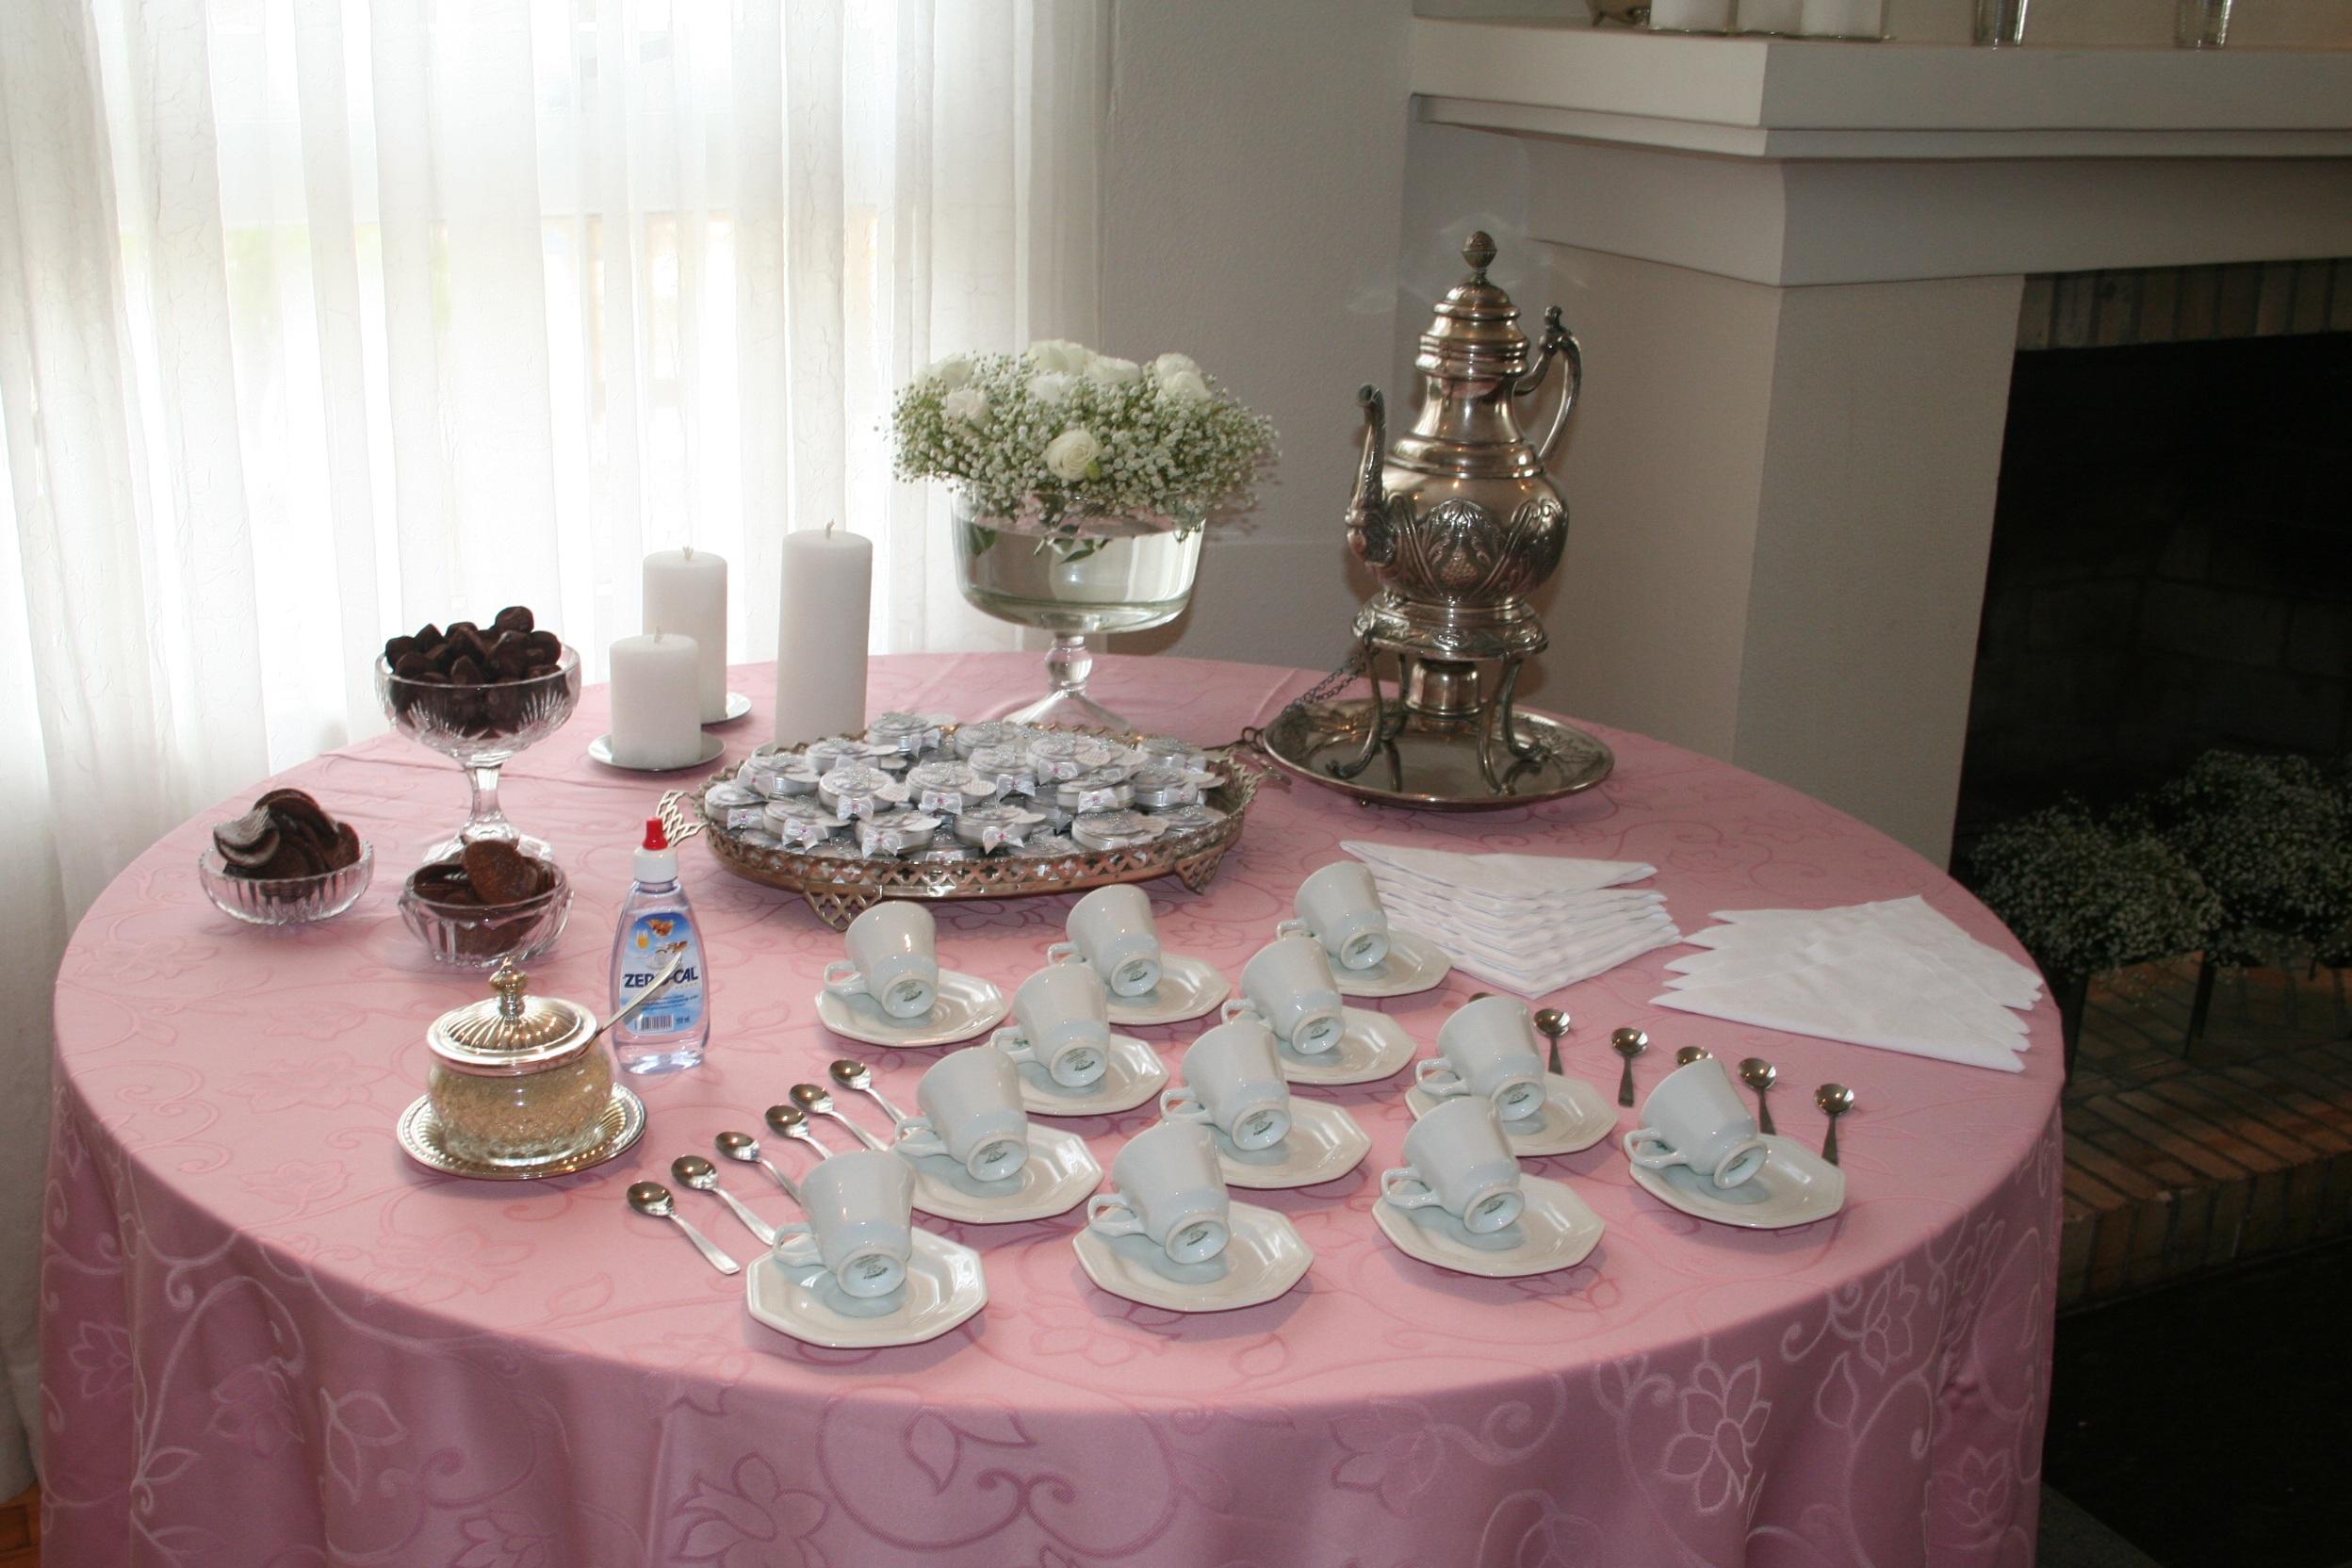 mesa flor comida comida postre pastel mesa de caf fiesta bautismo pastel de boda decoracin de